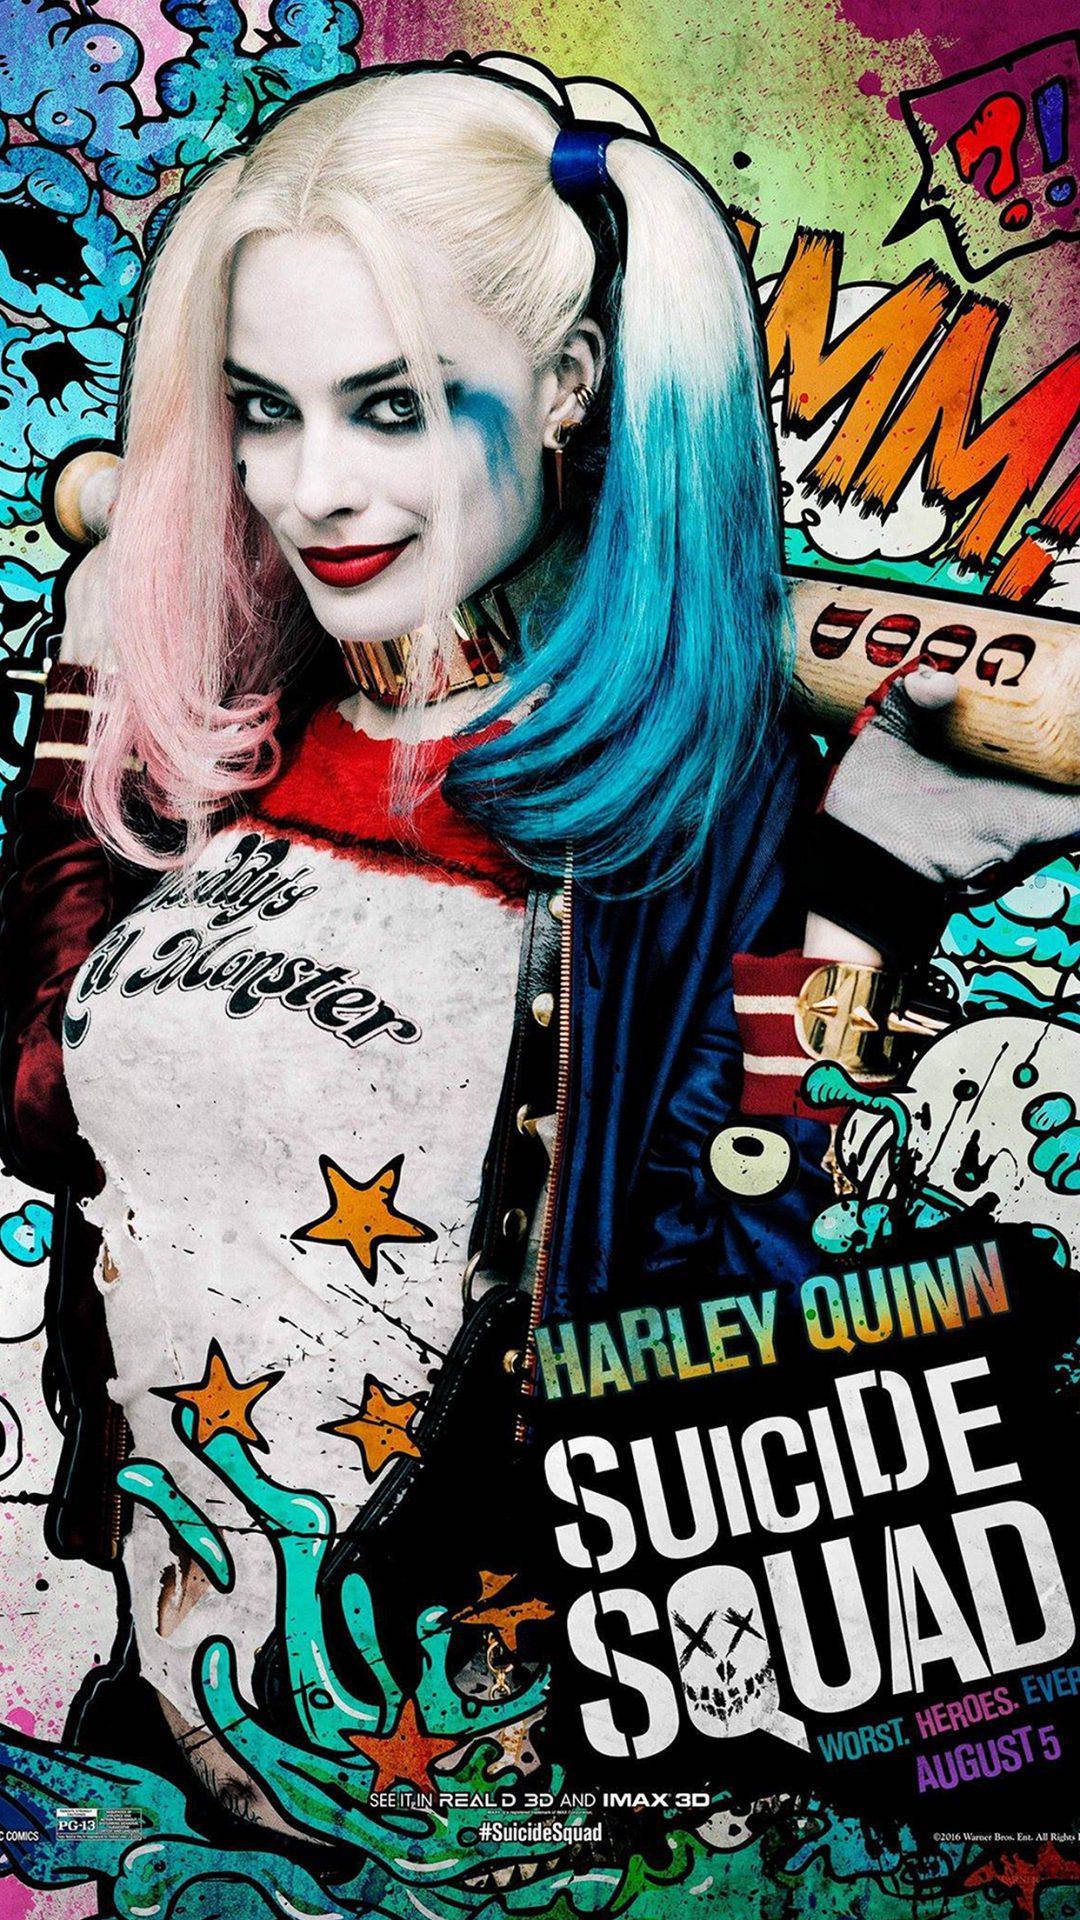 Suicide Squad Film Poster Art Illustration Joker Haley Quinn